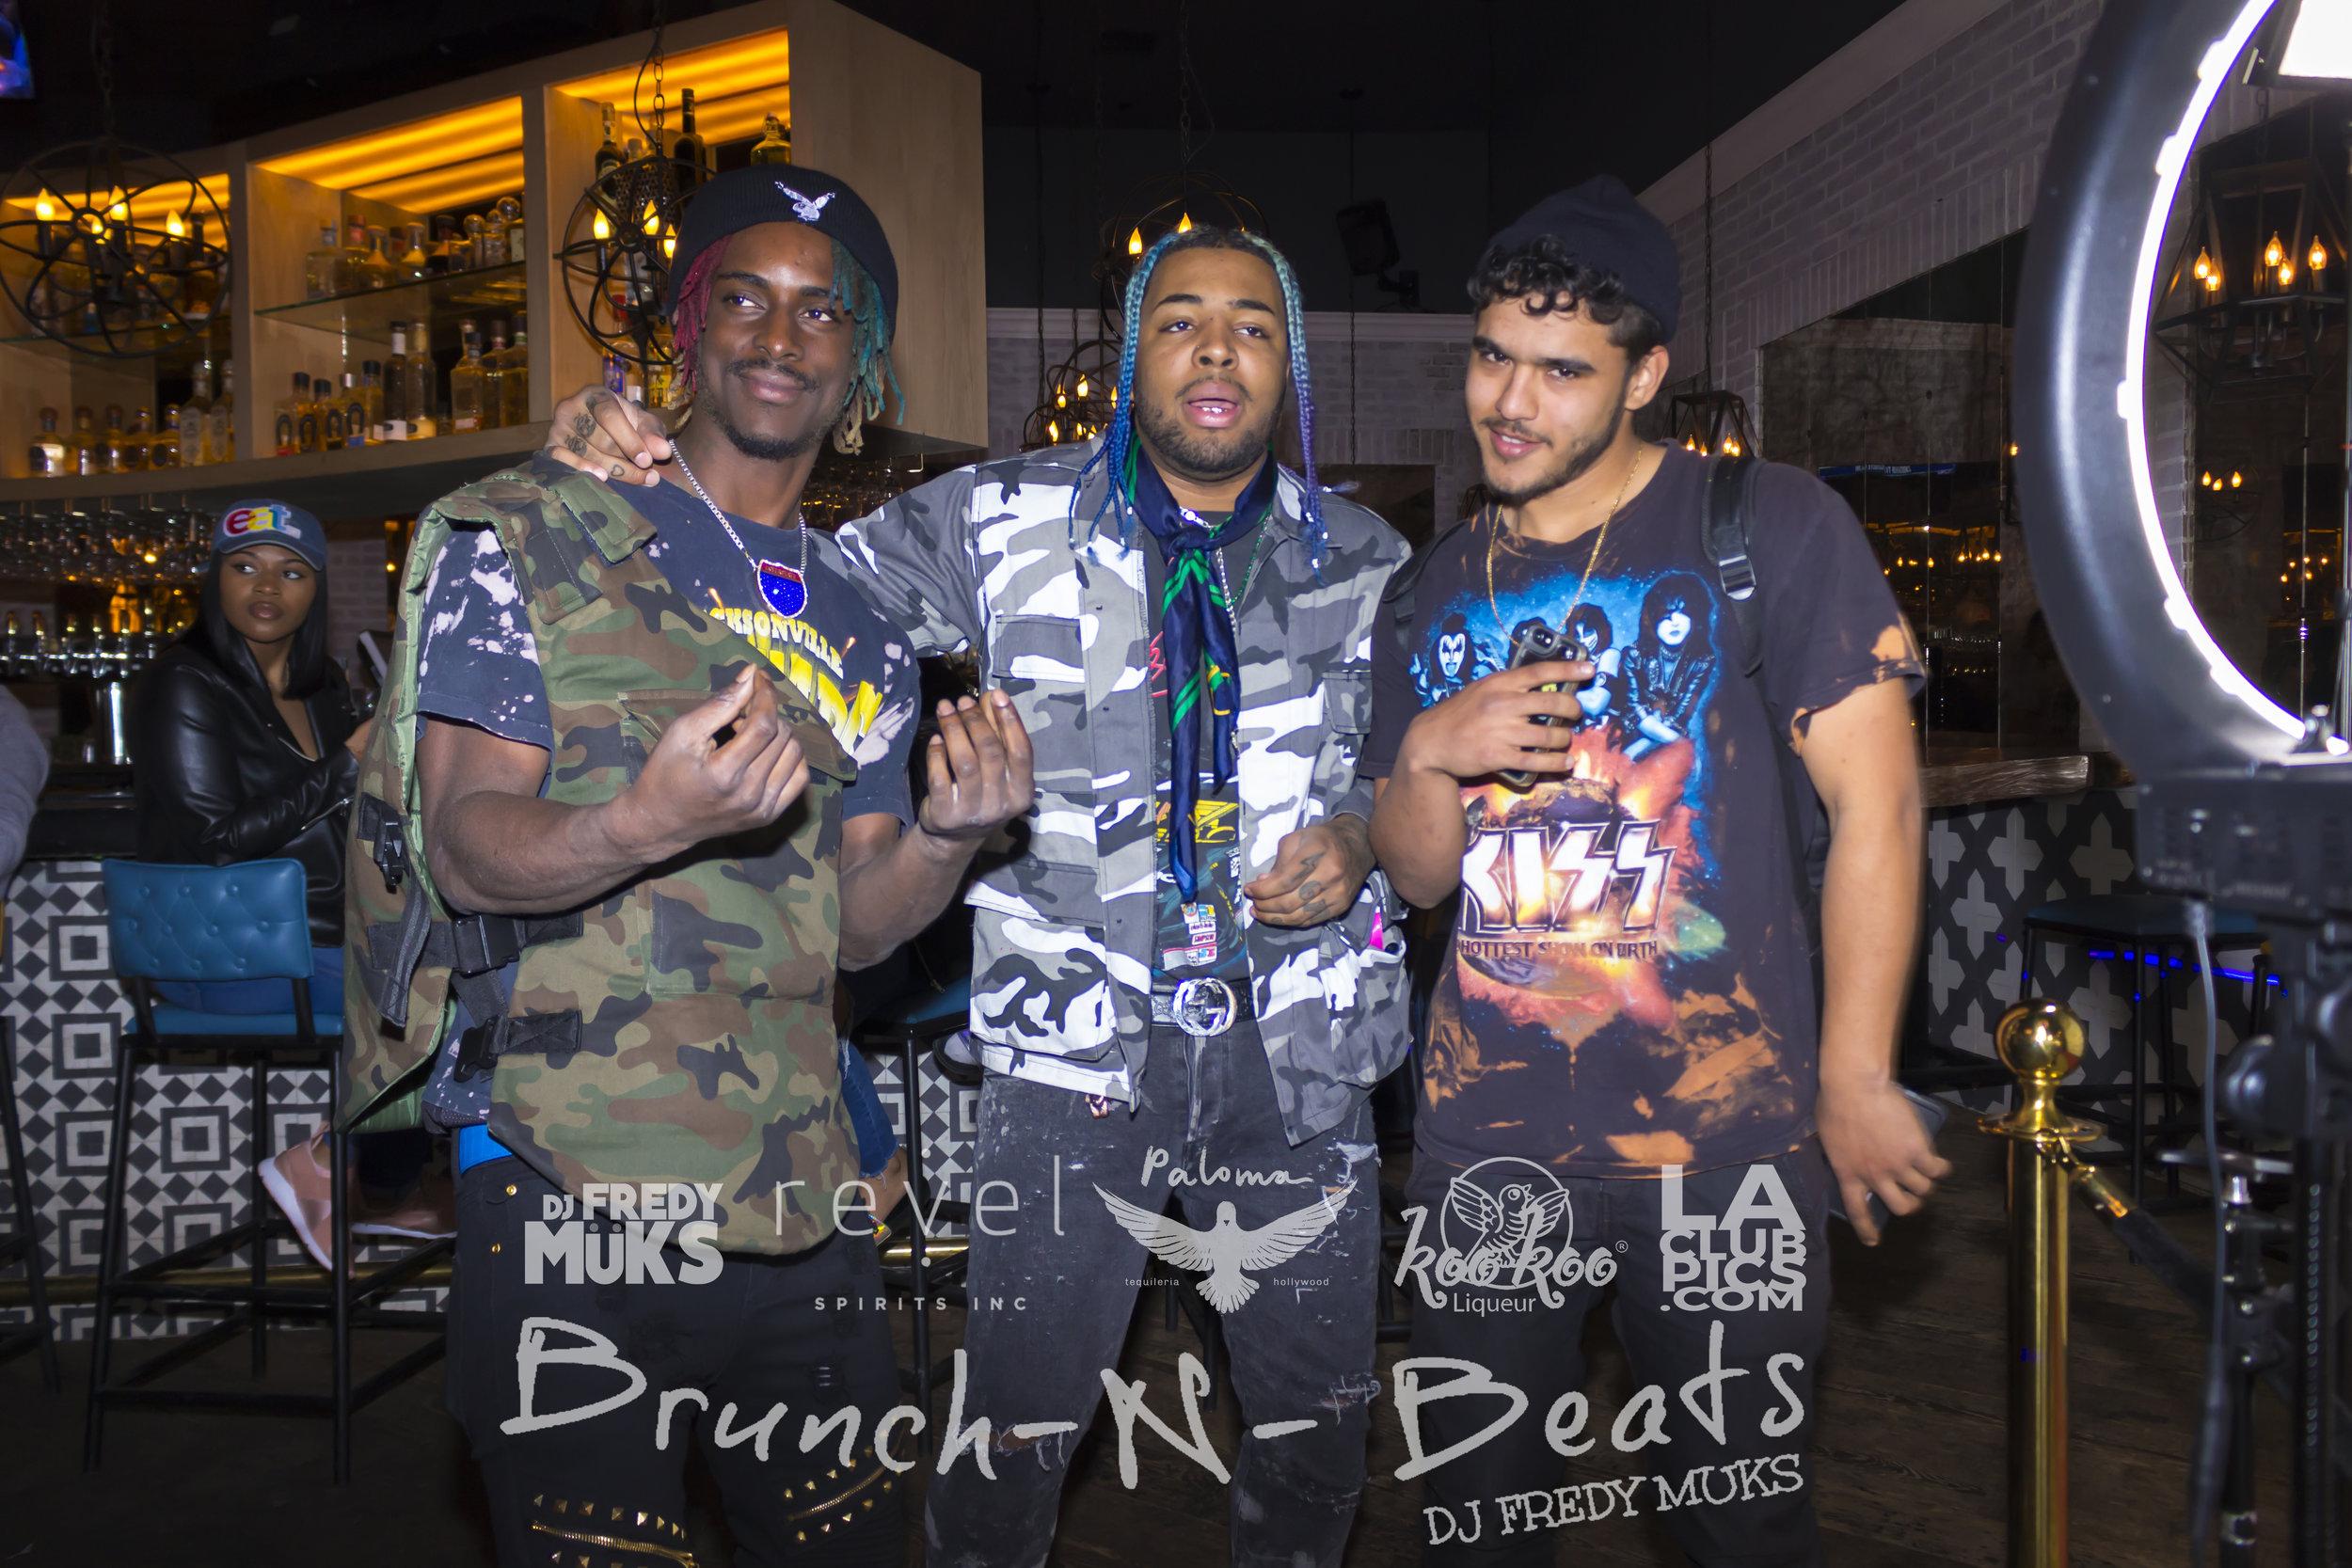 Brunch-N-Beats - Paloma Hollywood - 02-25-18_232.jpg